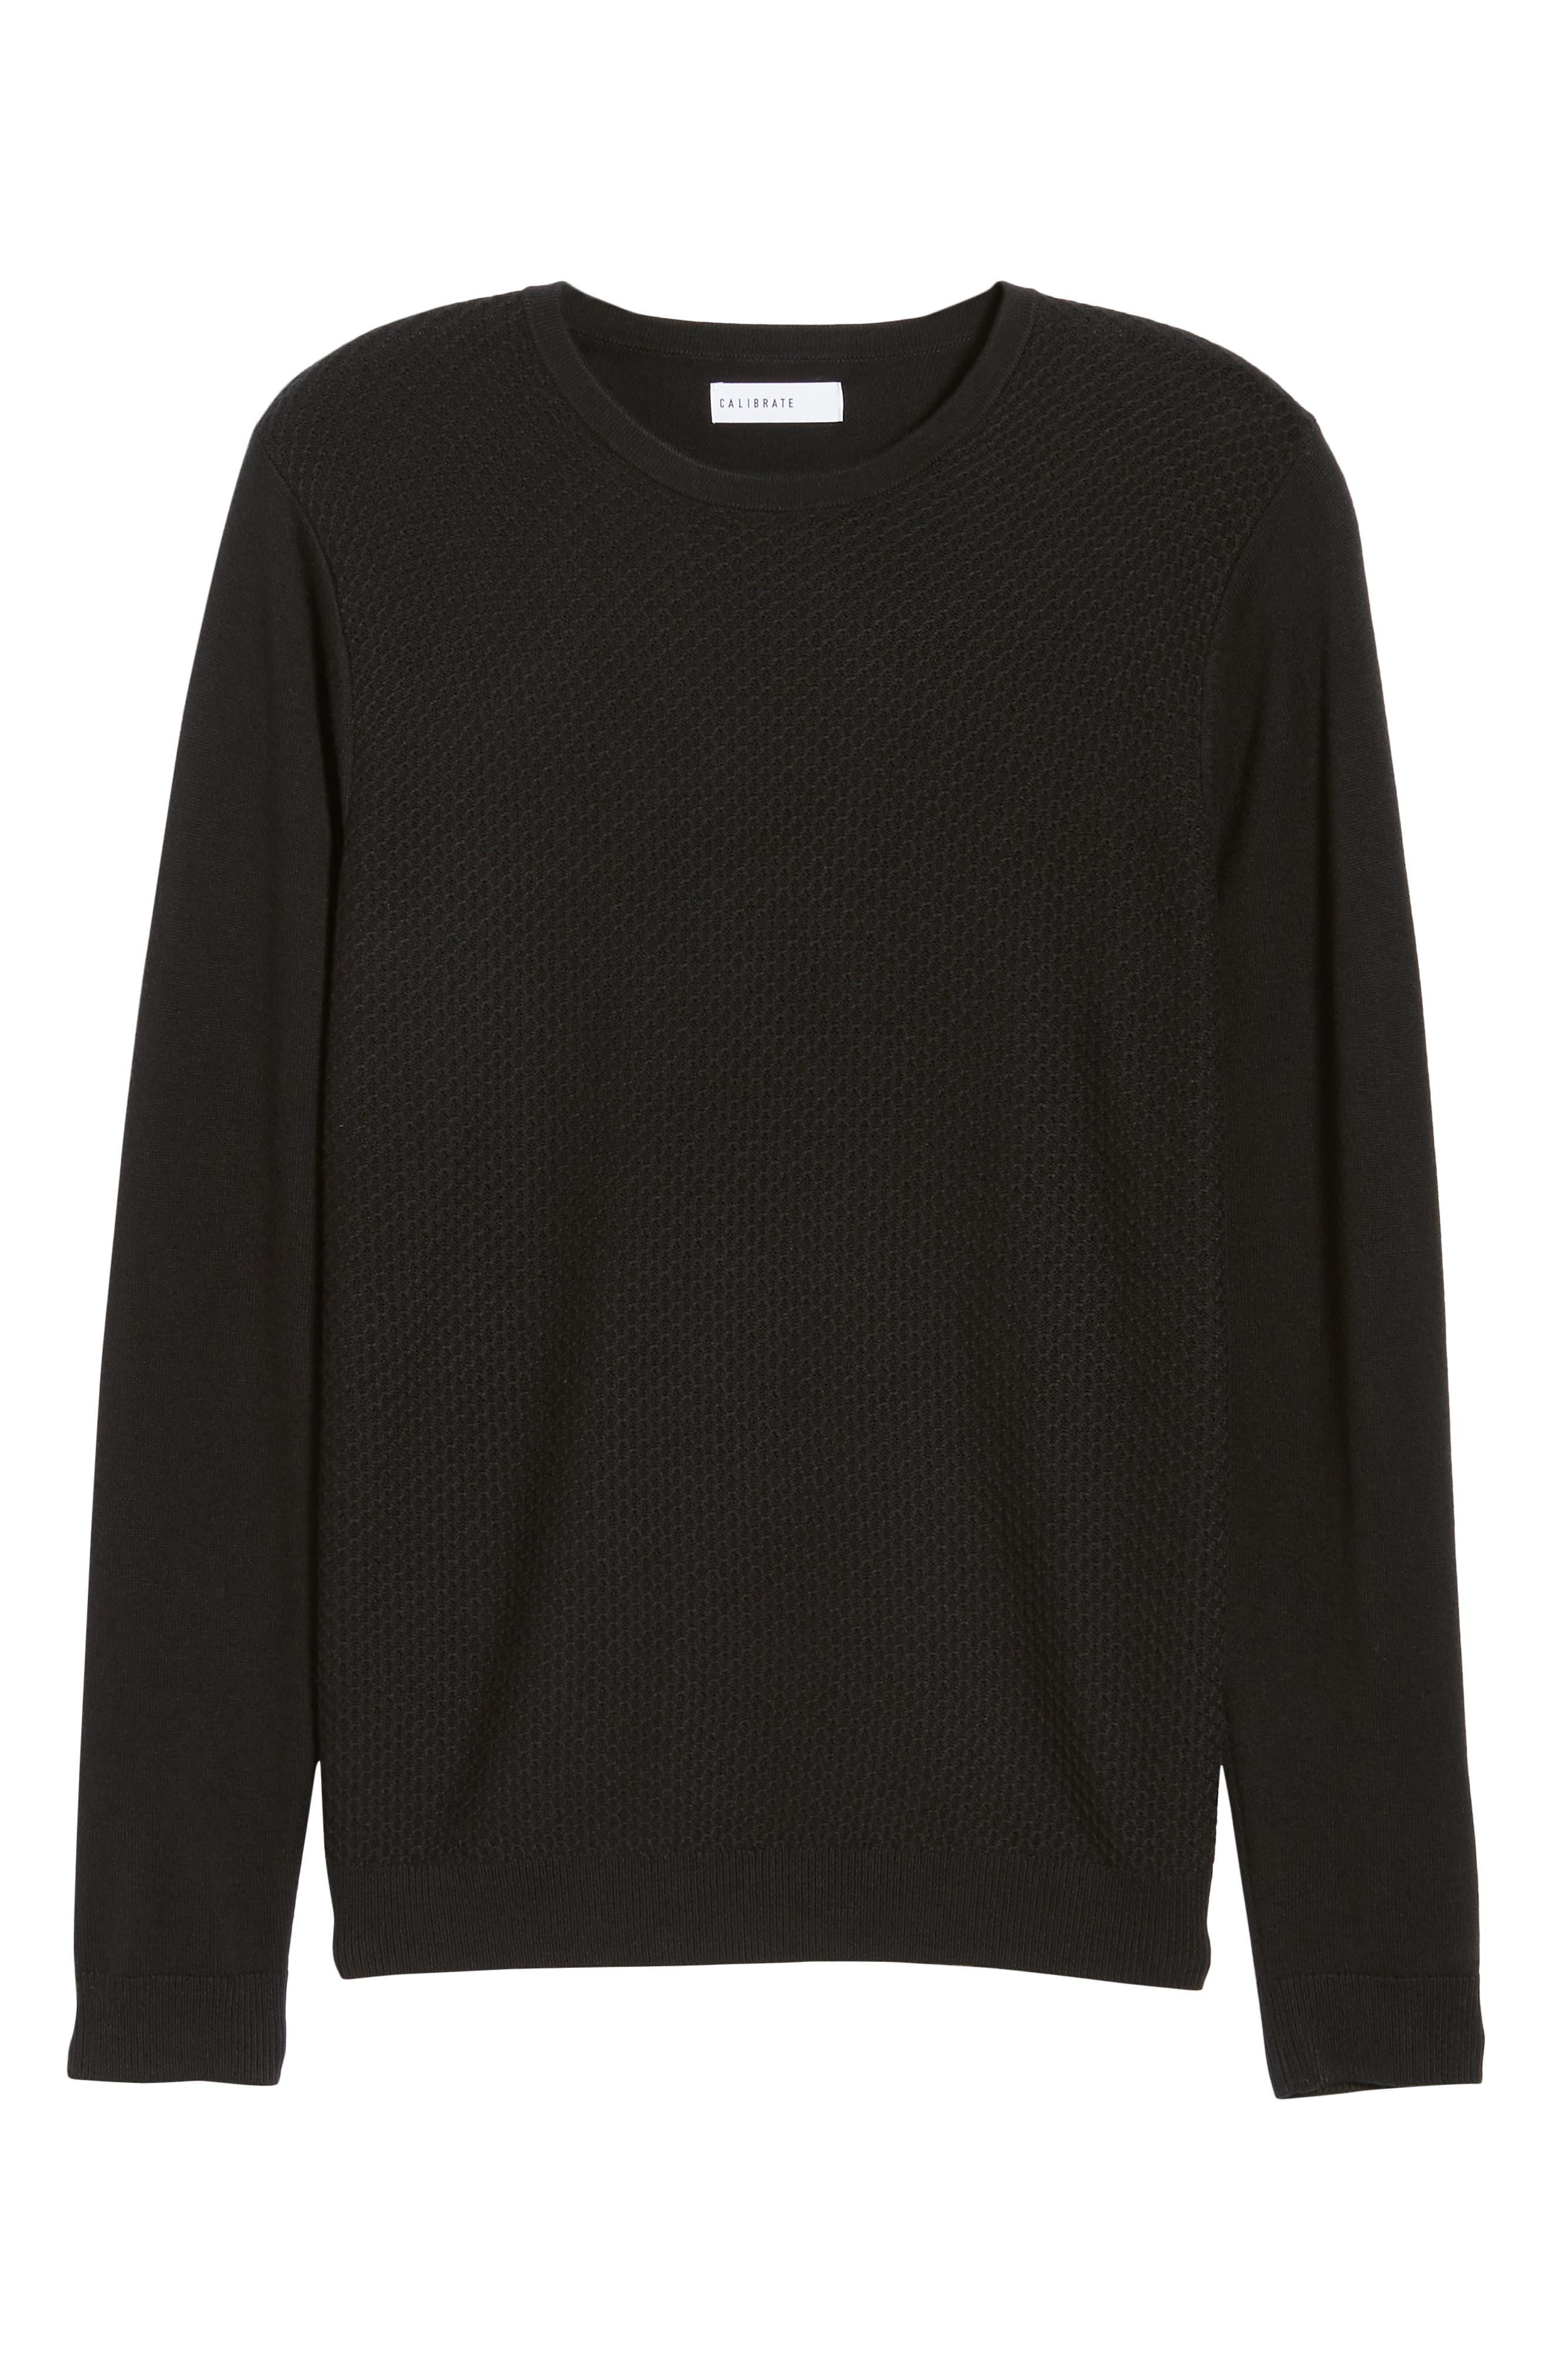 Honeycomb Crewneck Sweater,                             Alternate thumbnail 6, color,                             001